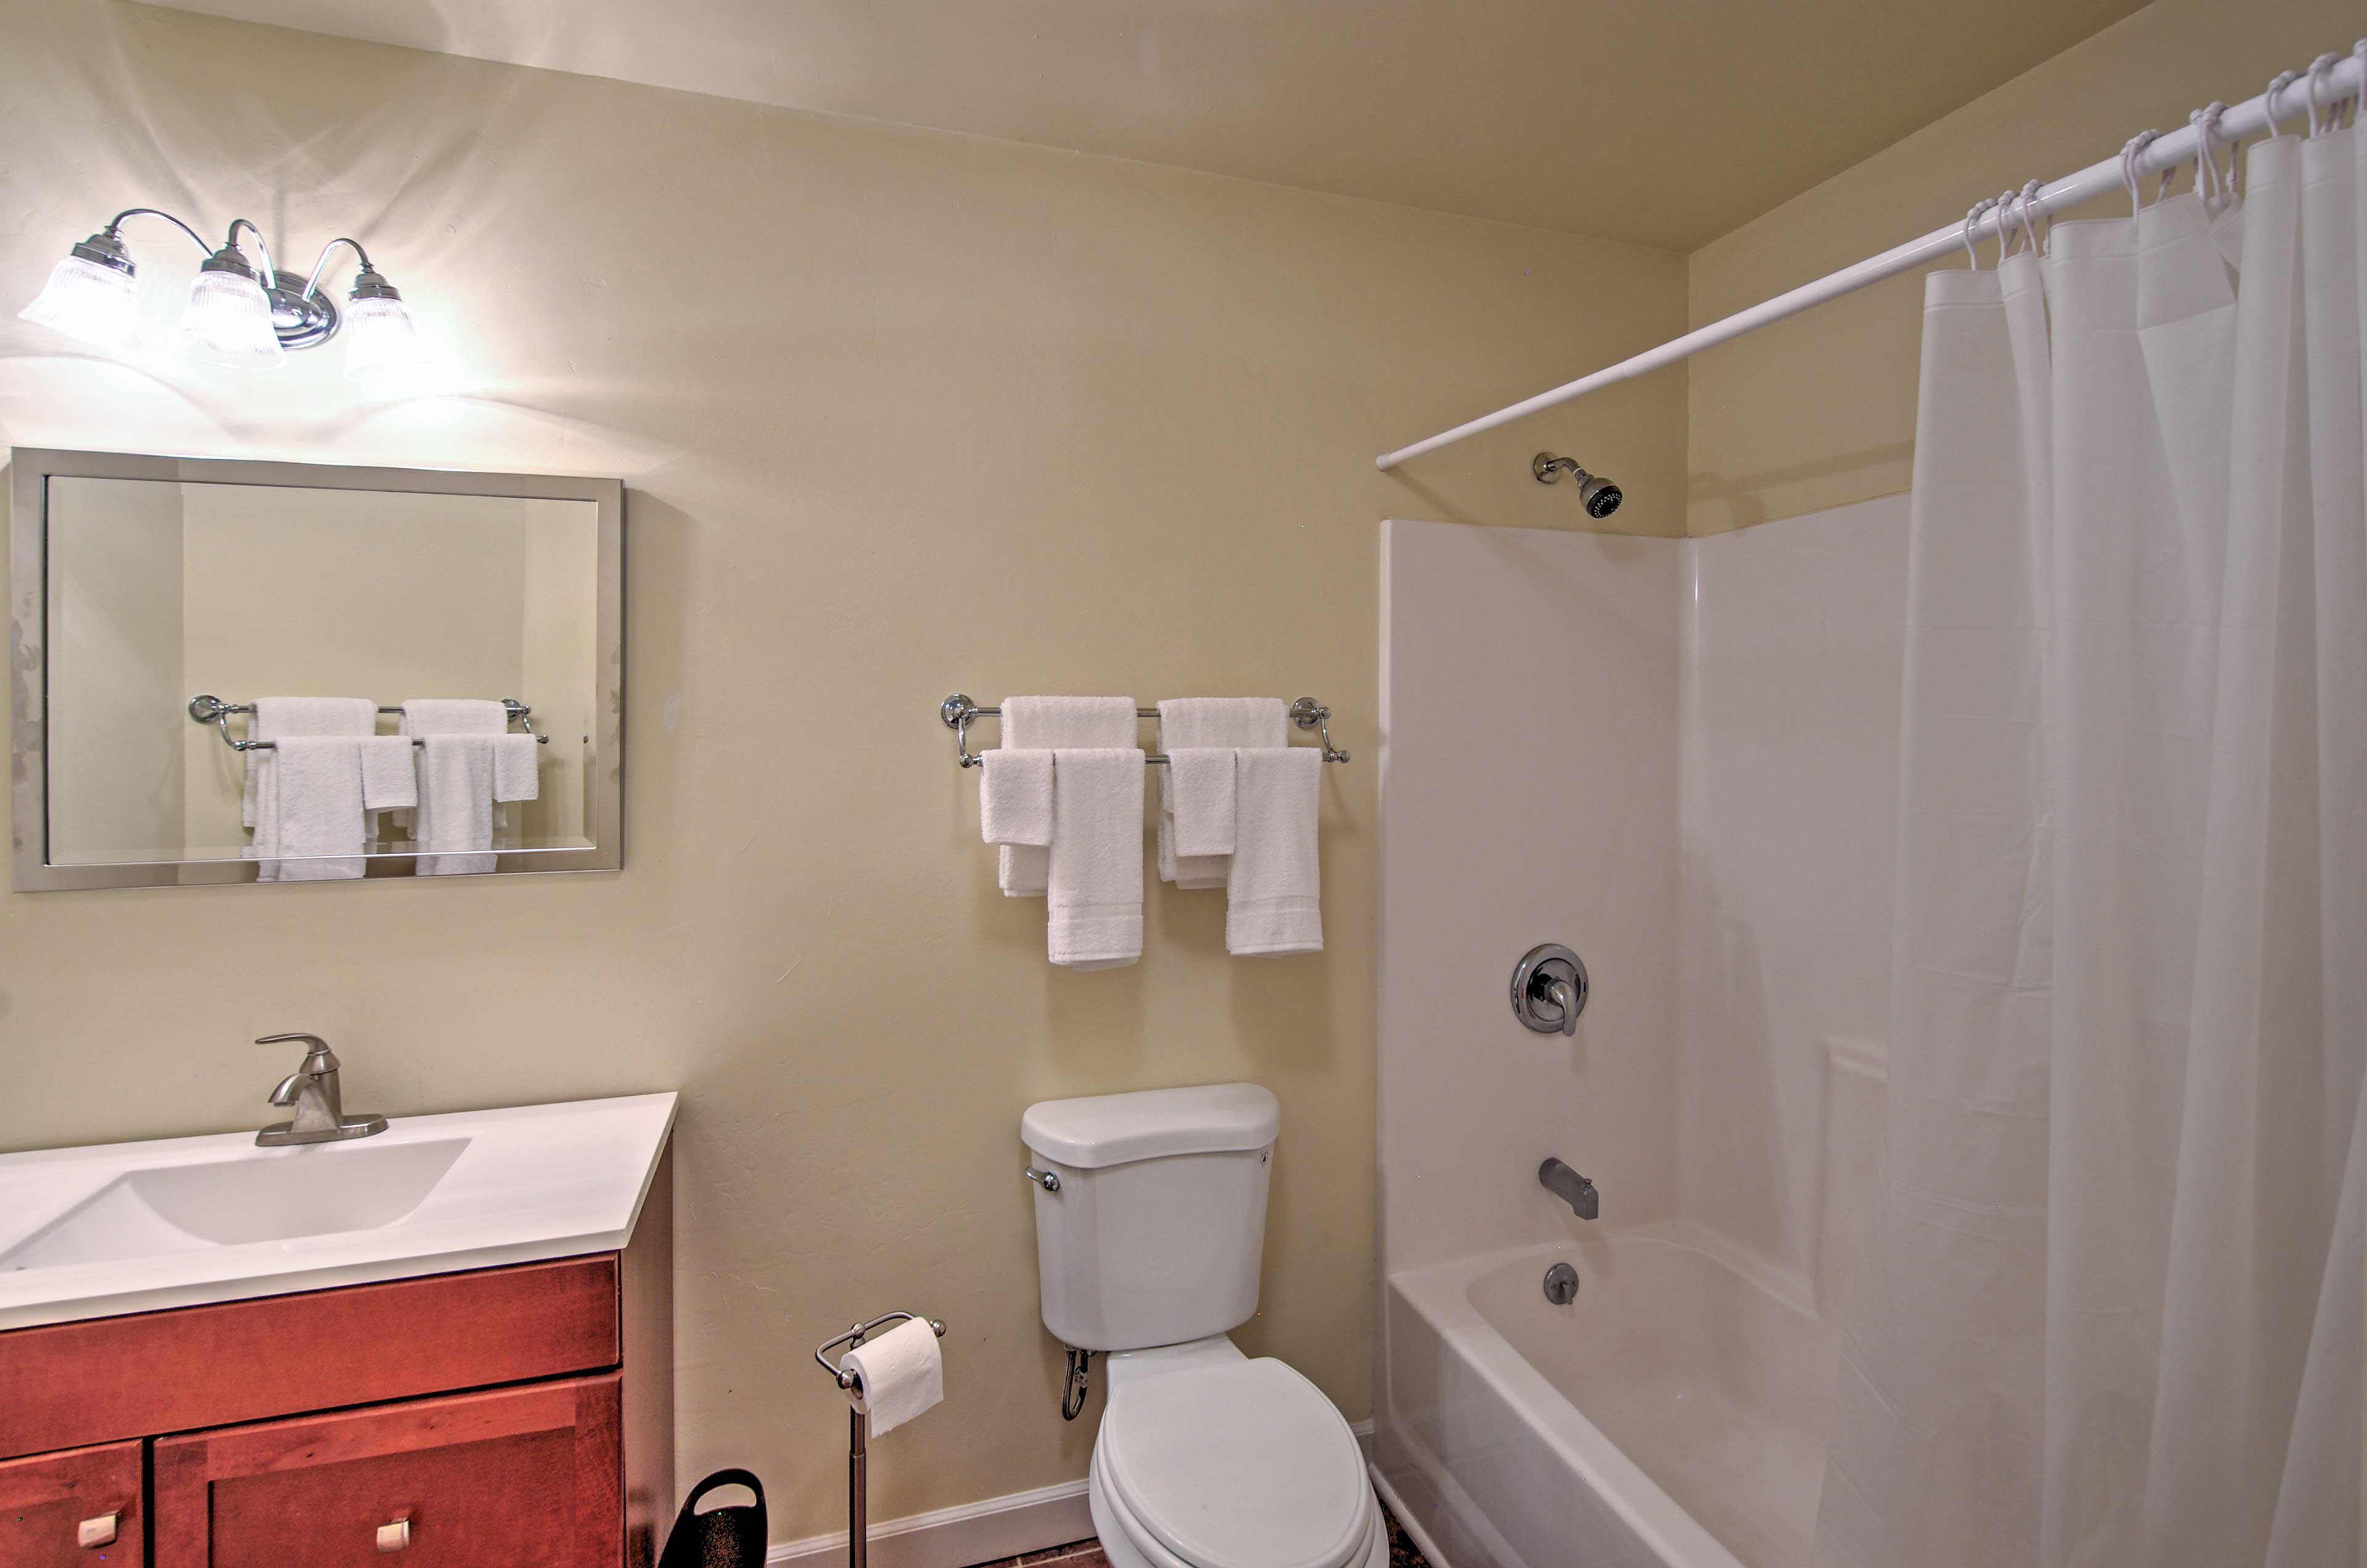 The bathroom has a full shower/tub combo.